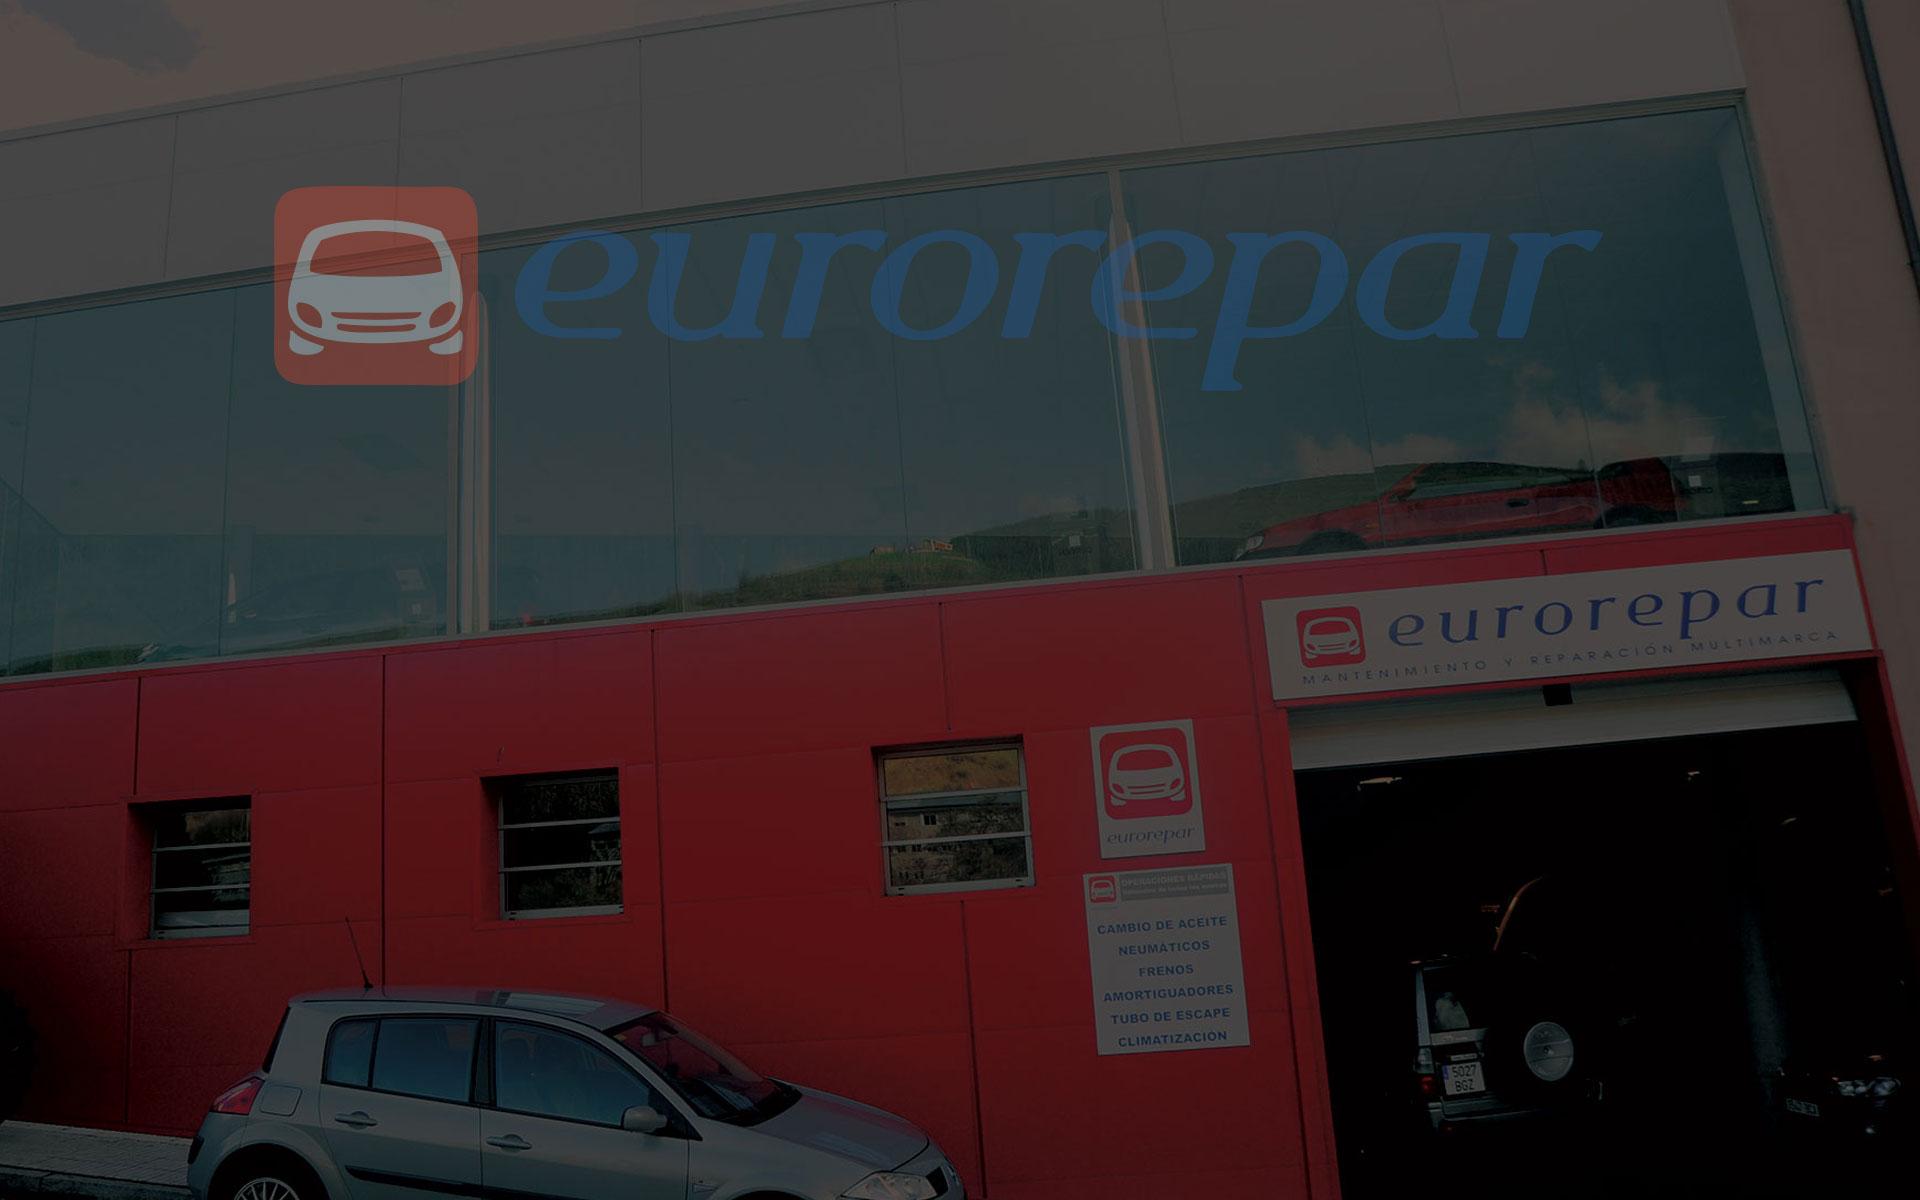 Talleres Eurorepar